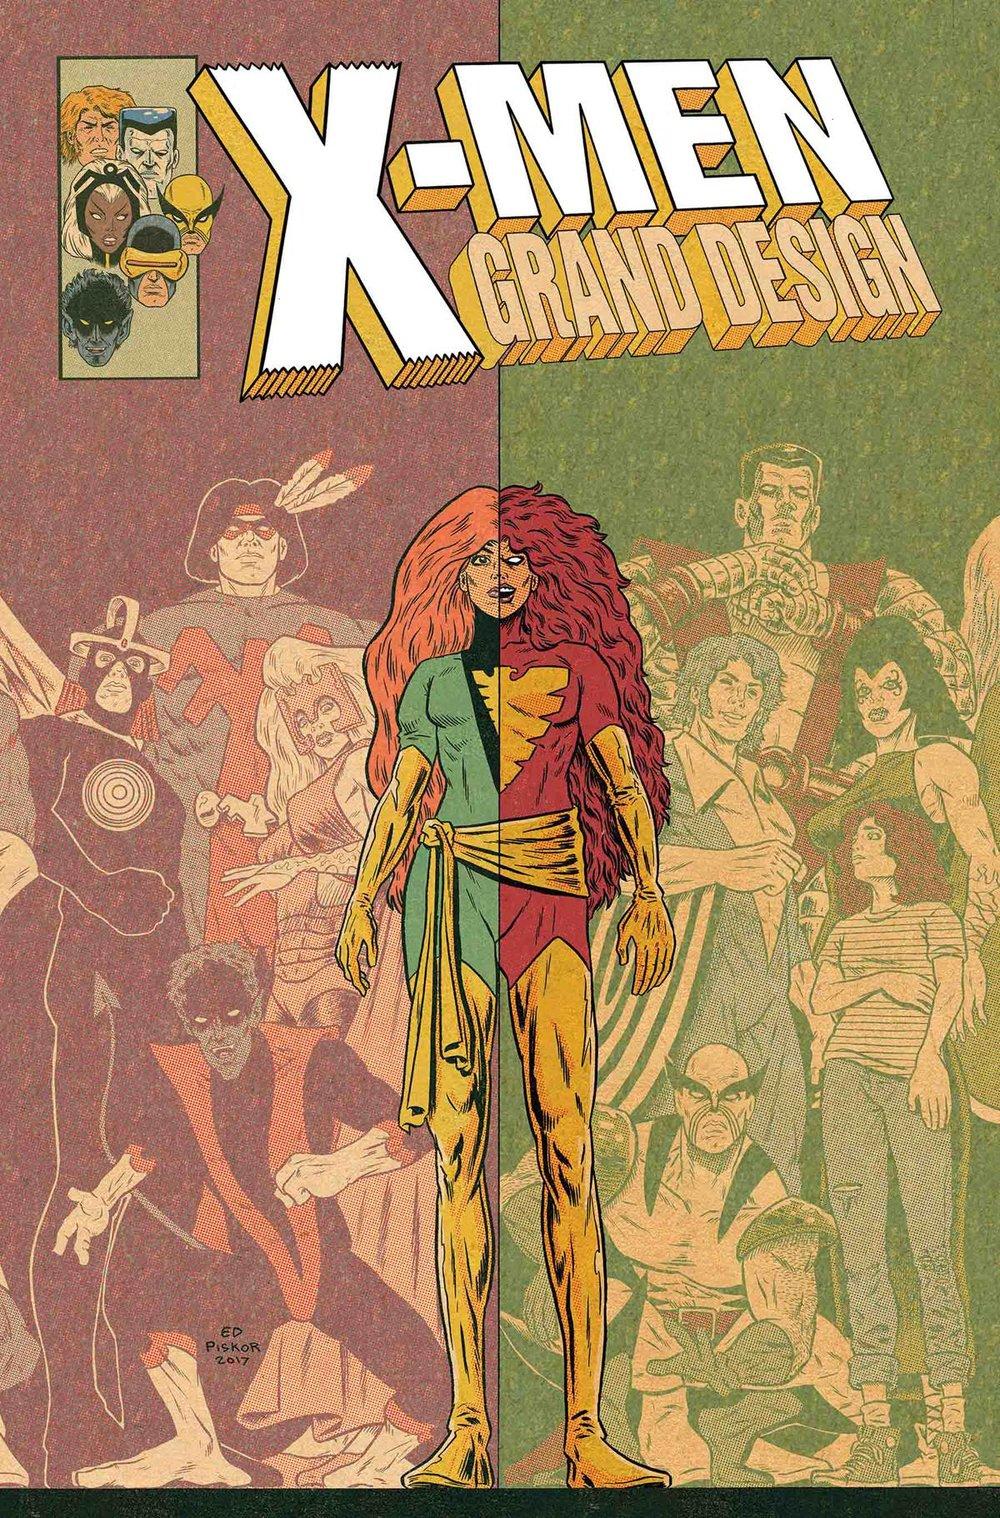 X-MEN GRAND DESIGN SECOND GENESIS #1